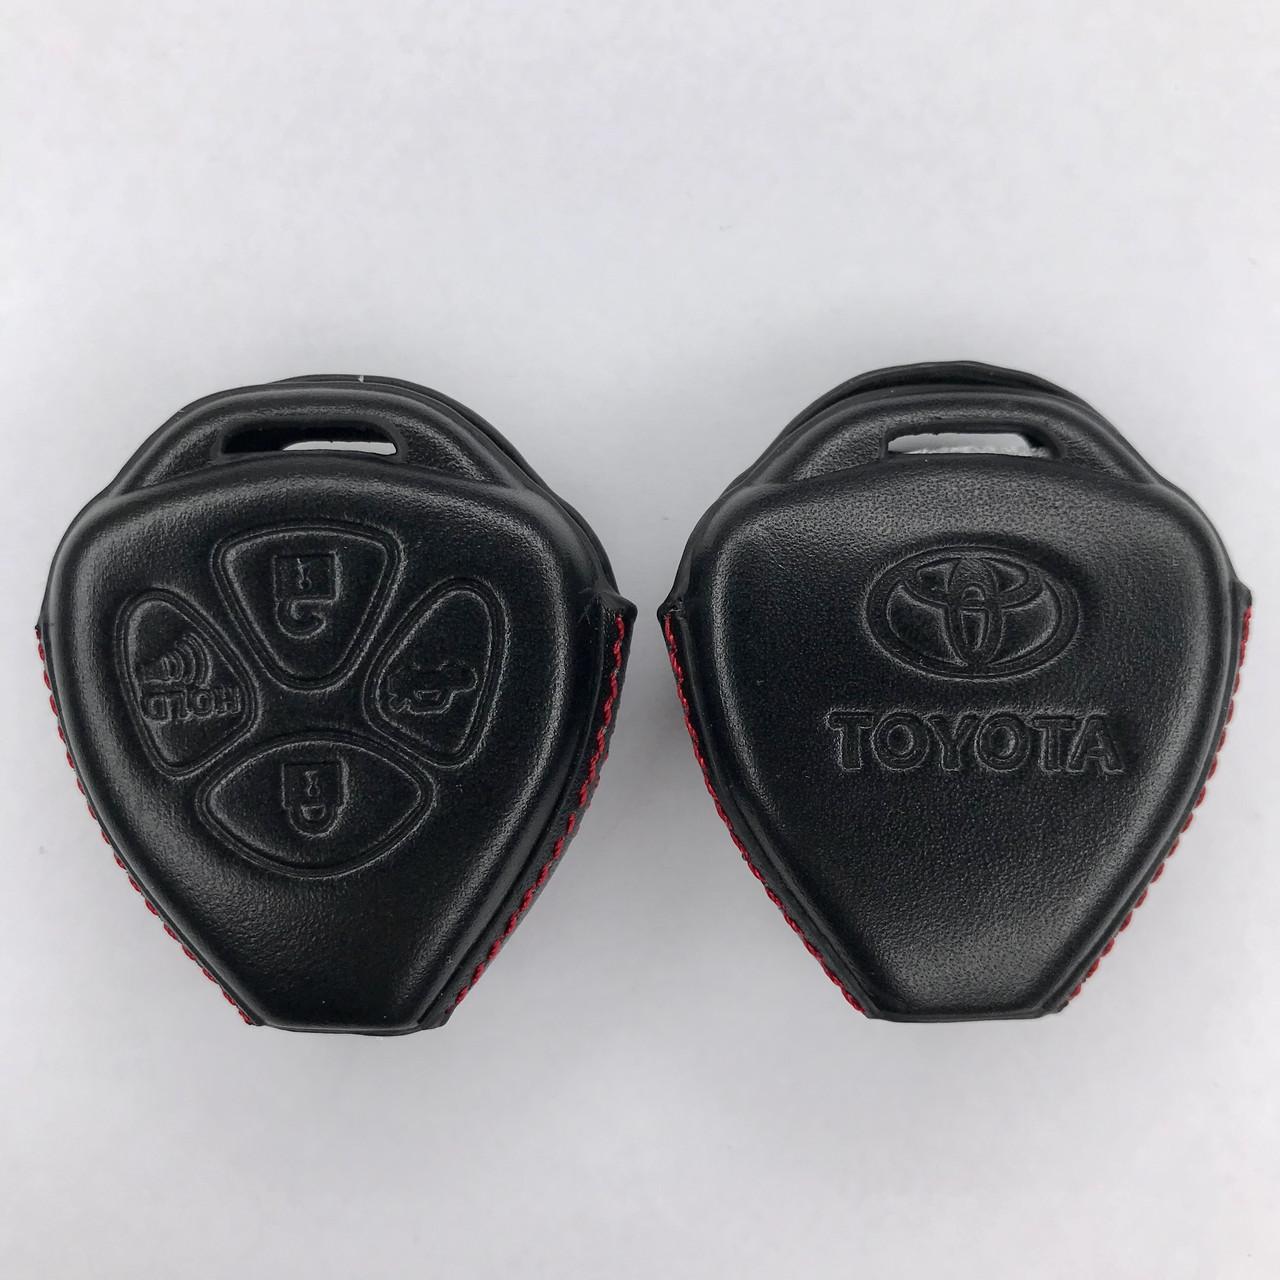 Кожаный чехол чехол для ключа Toyota Yaris,Auris,Highlander, Land Cruiser,Rav4,Camry,Corolla, Avalon,Avensis